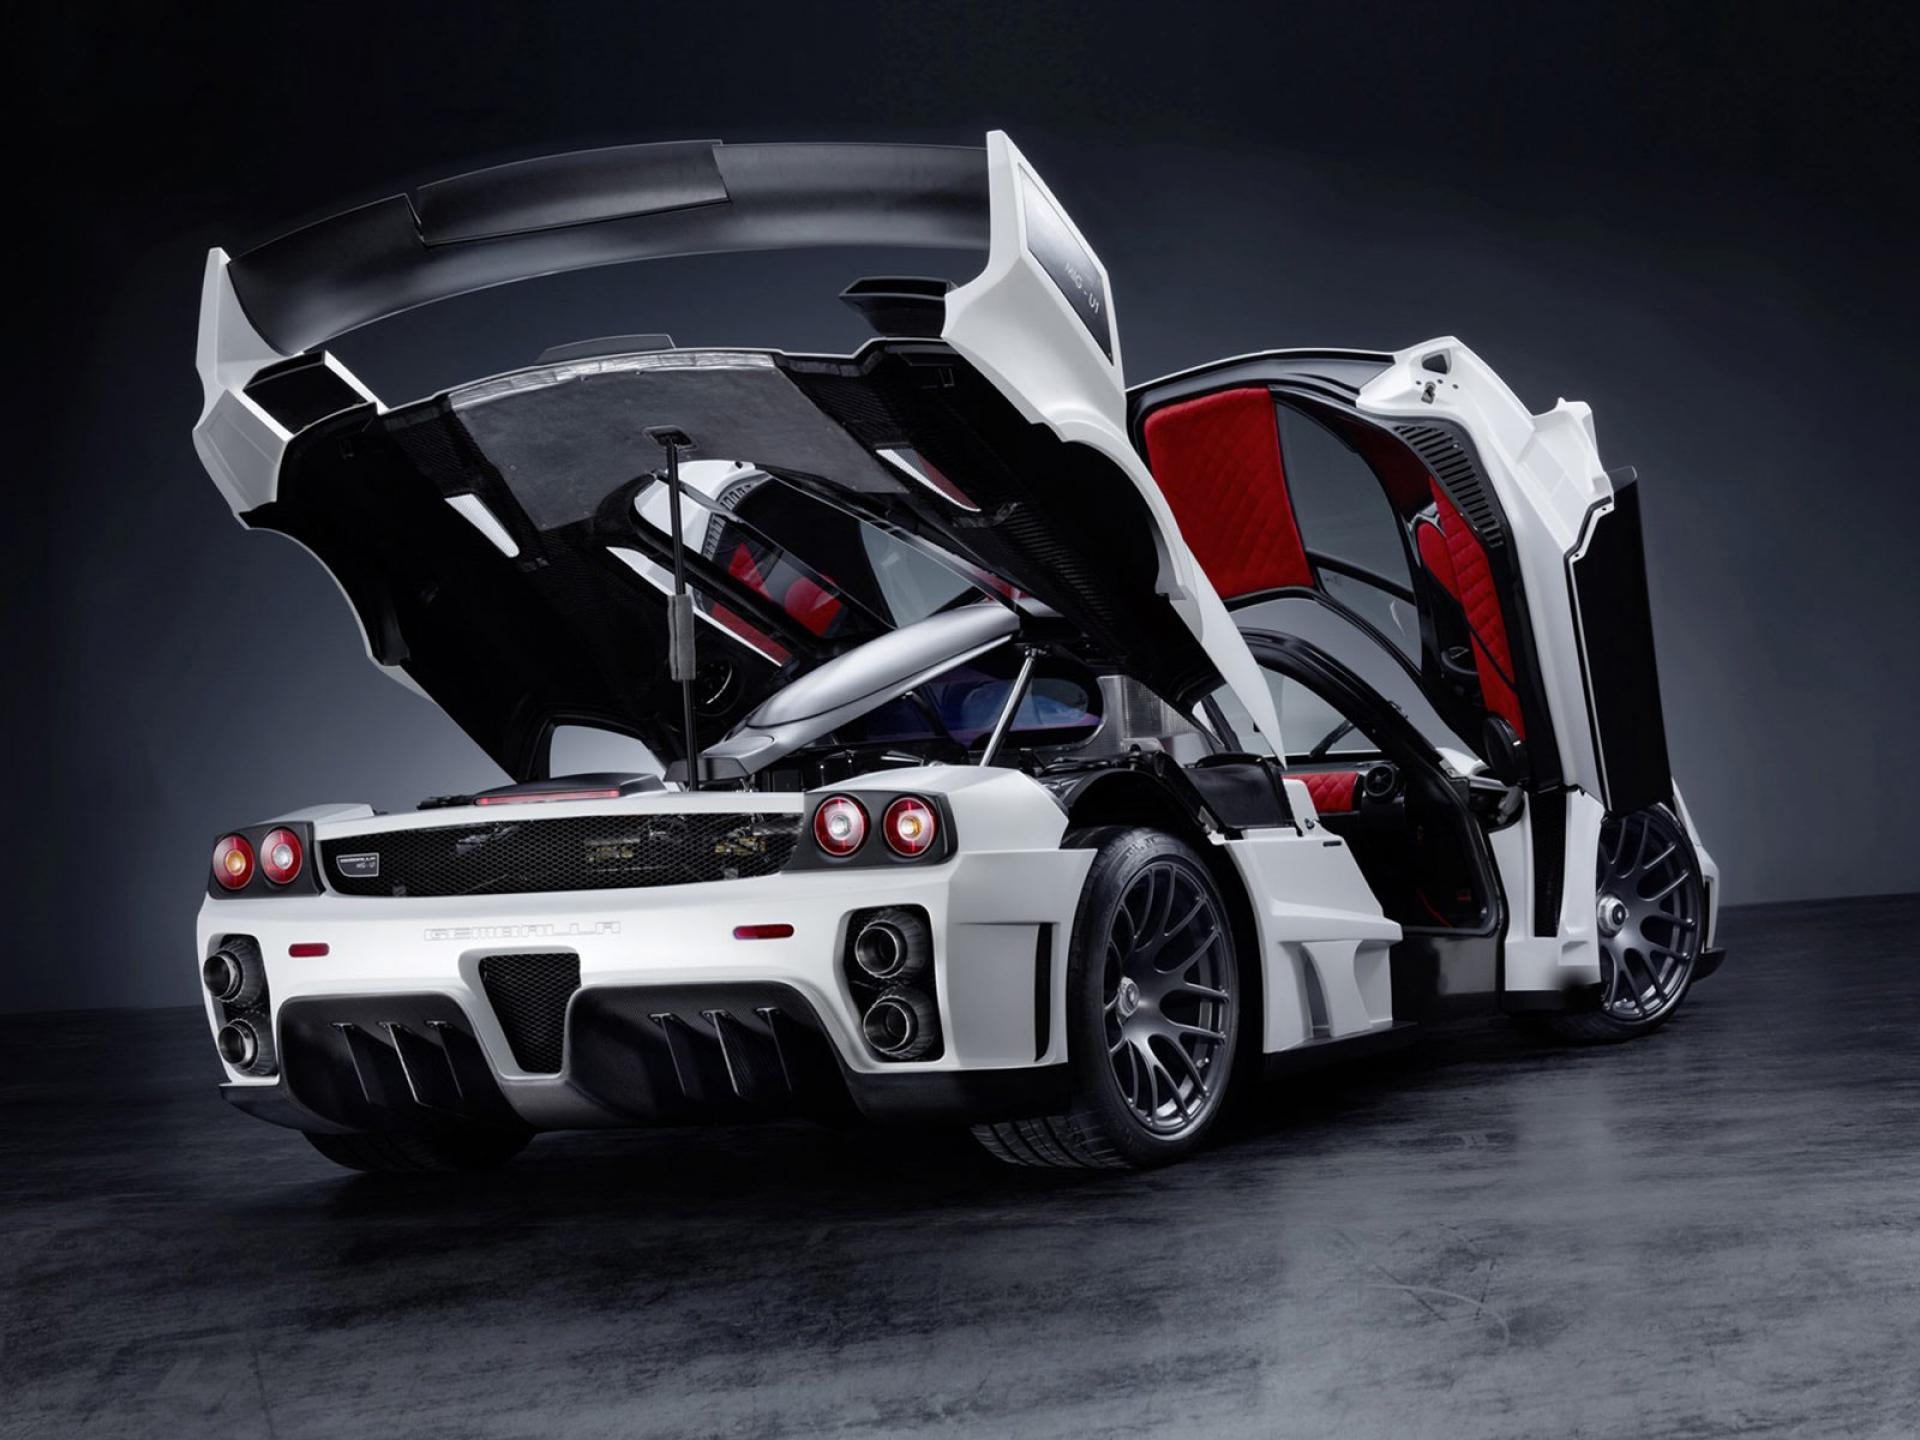 Sports Cars Wallpaper Hd  WallpaperSafari